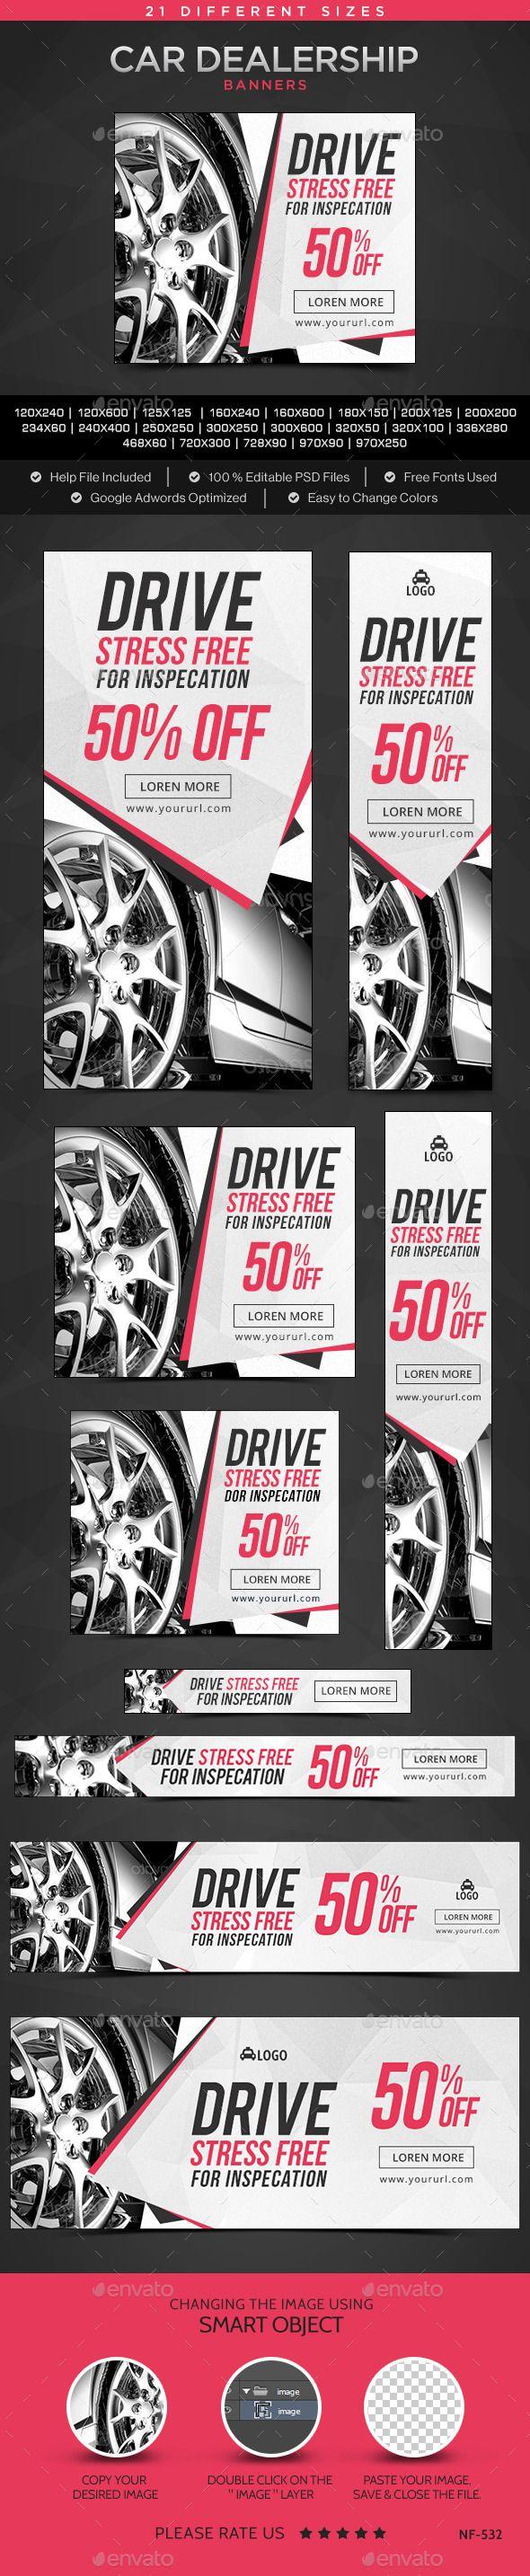 Car Dealership Banners Template #design Download: http://graphicriver.net/item/car-dealership-banners/12239250?ref=ksioks